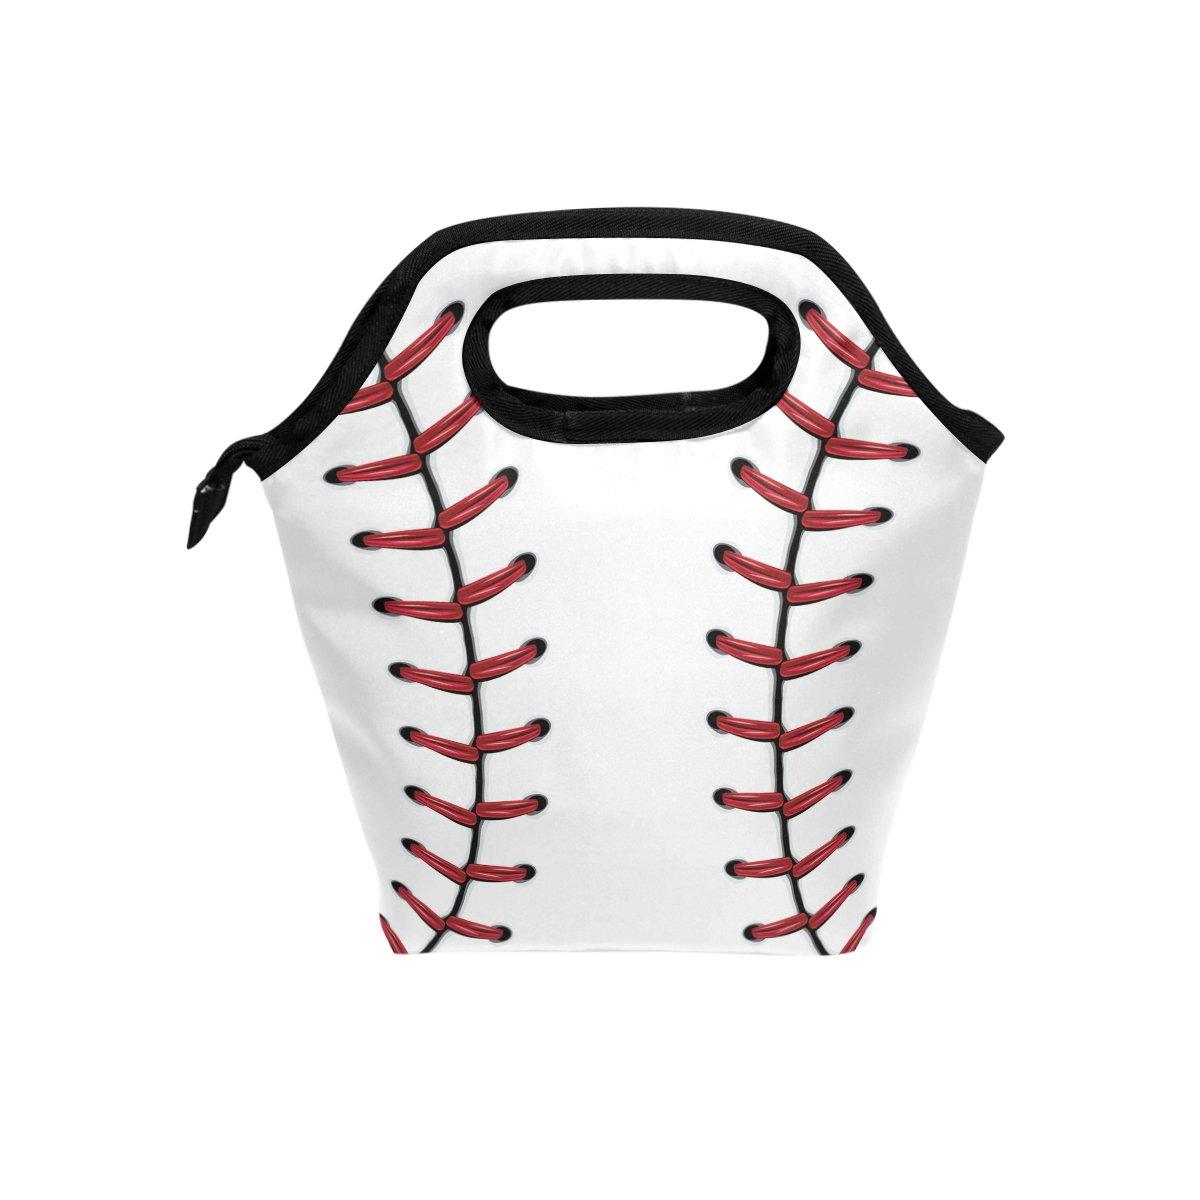 Naanle Sport Baseball Insulated Zipper Lunch Bag Cooler Tote Bag for Adult Teens Kids Girls Boys Men Women, Sport Lunch Boxes Lunchboxes Meal Prep Handbag for School Office